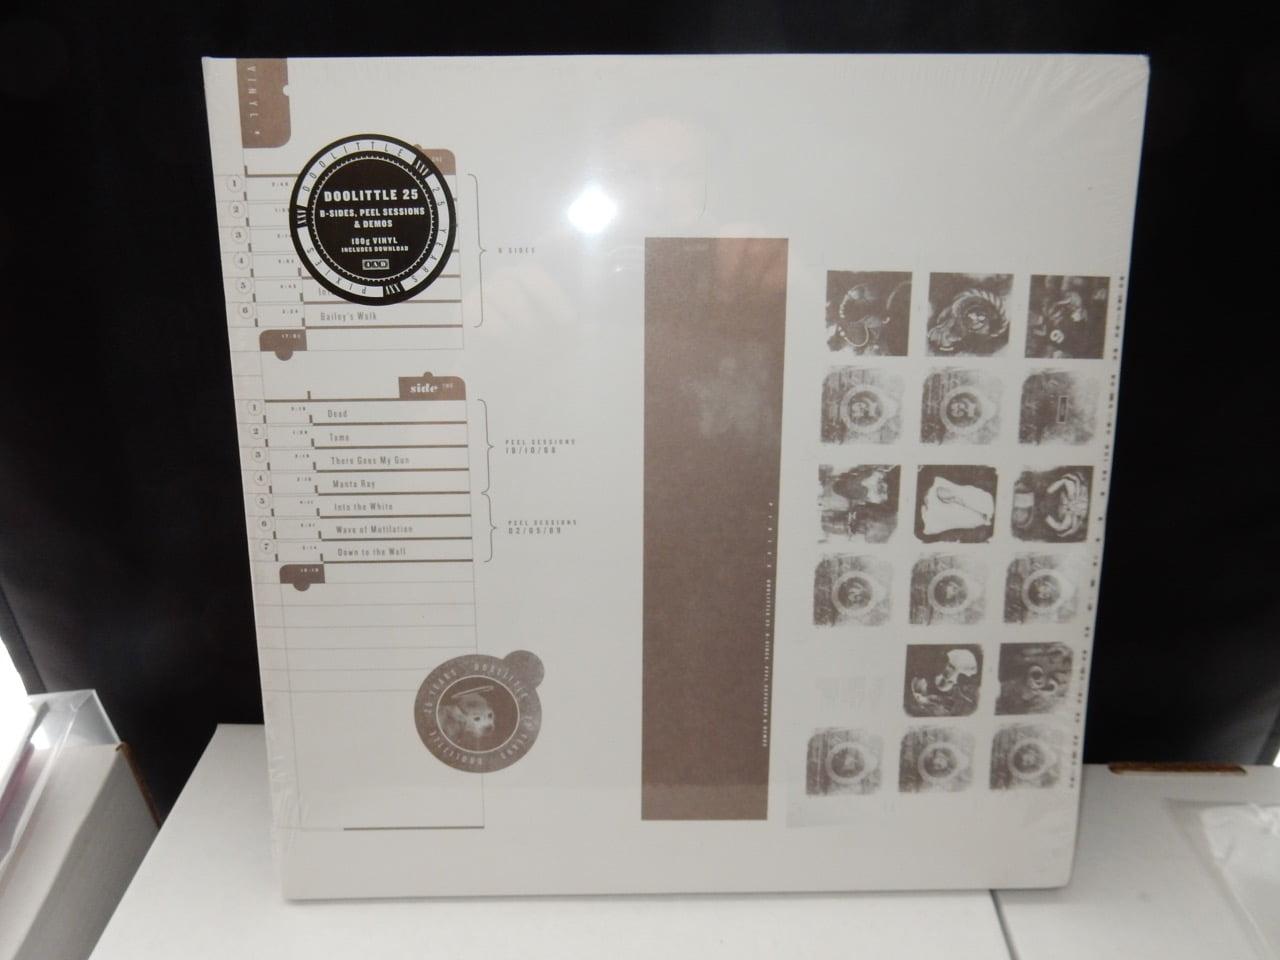 Pixies Doolittle 25 Vinyl